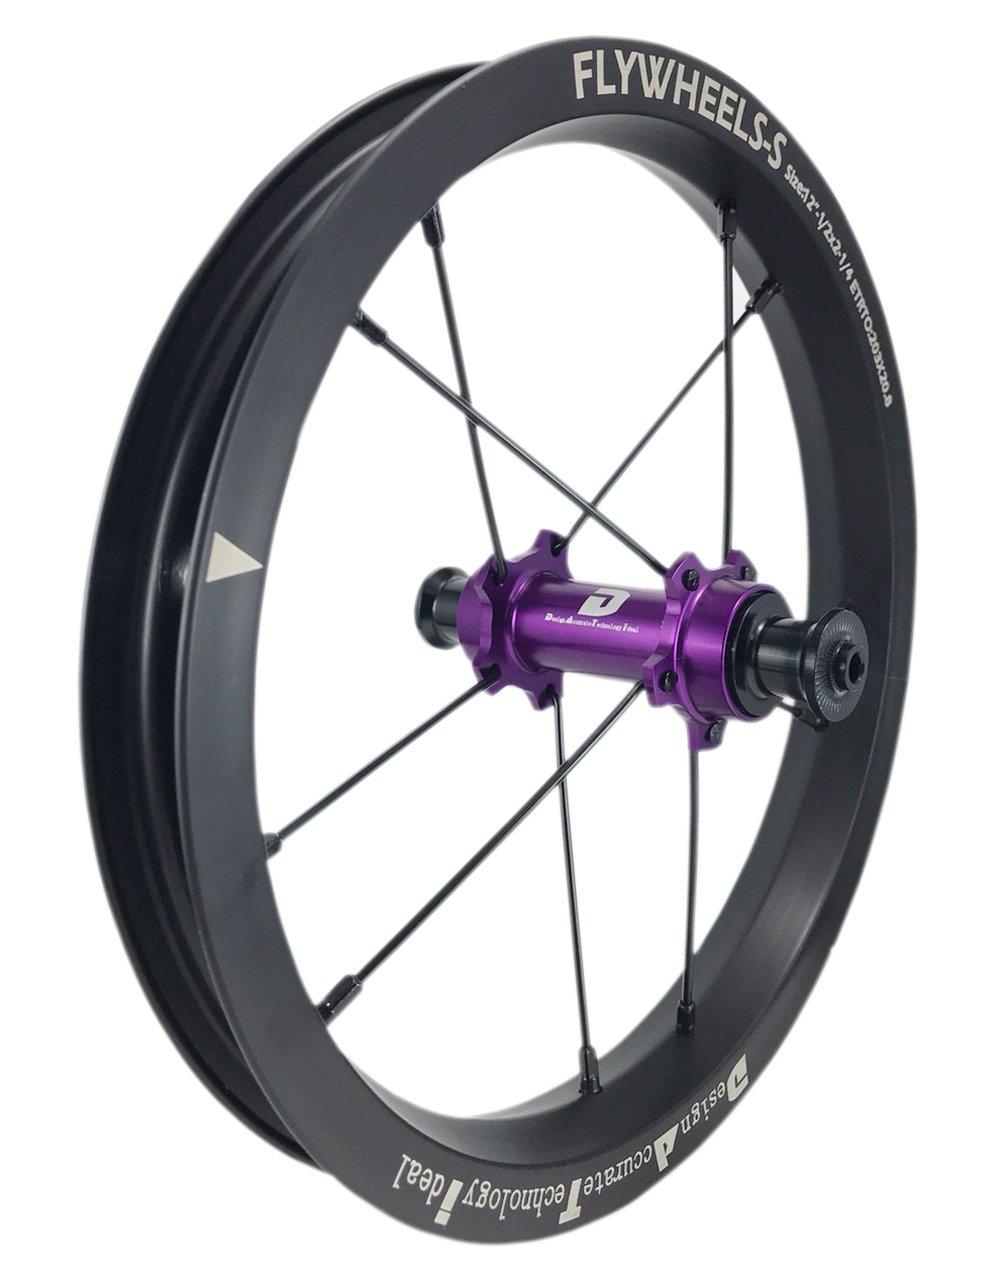 DATI 12インチ S7X-W Alloy レース レベル. 低抵抗.スムーズ.バランスバイク Kids Balance Bike Bicycle Super light 子供自転車ホイール B07DKC22YZ Strider :95*8MM|紫 紫 Strider :95*8MM